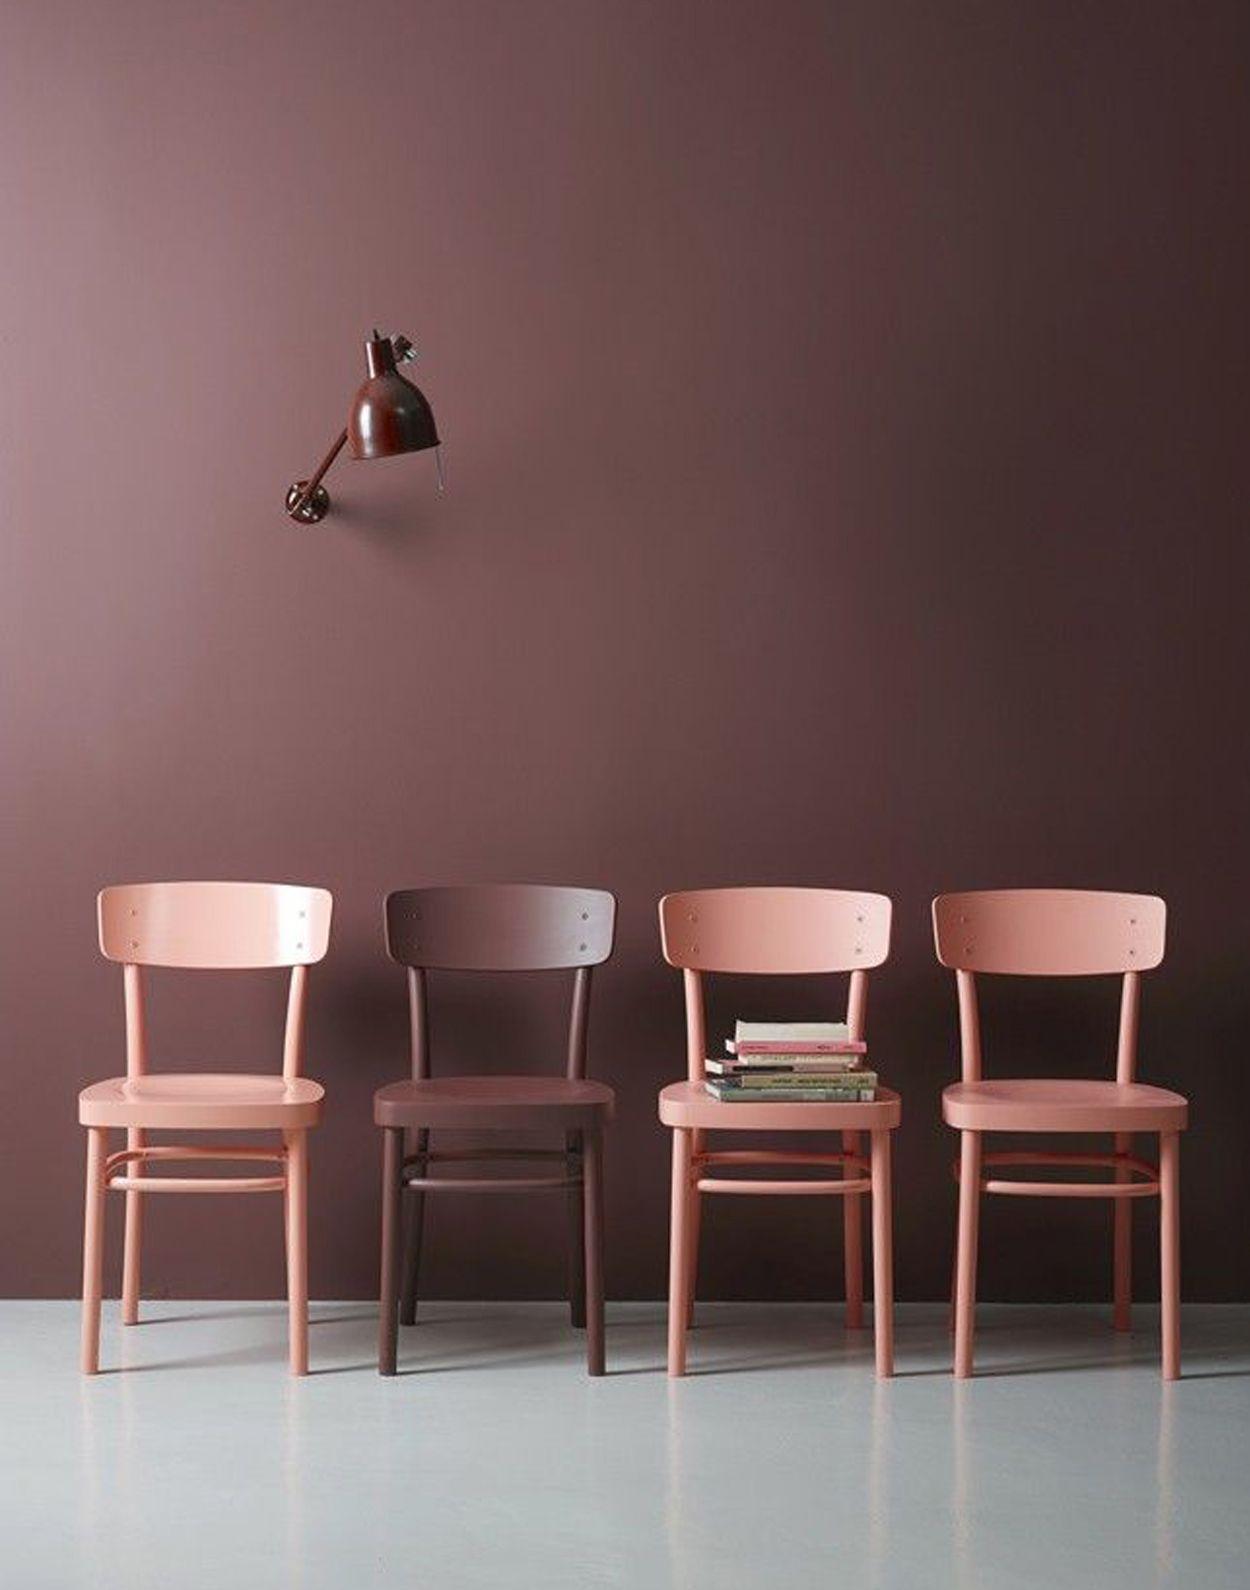 Kep Forrasa Lady Inspirasjonsblogg Jotun No Decor Home Decor Colorful Interiors